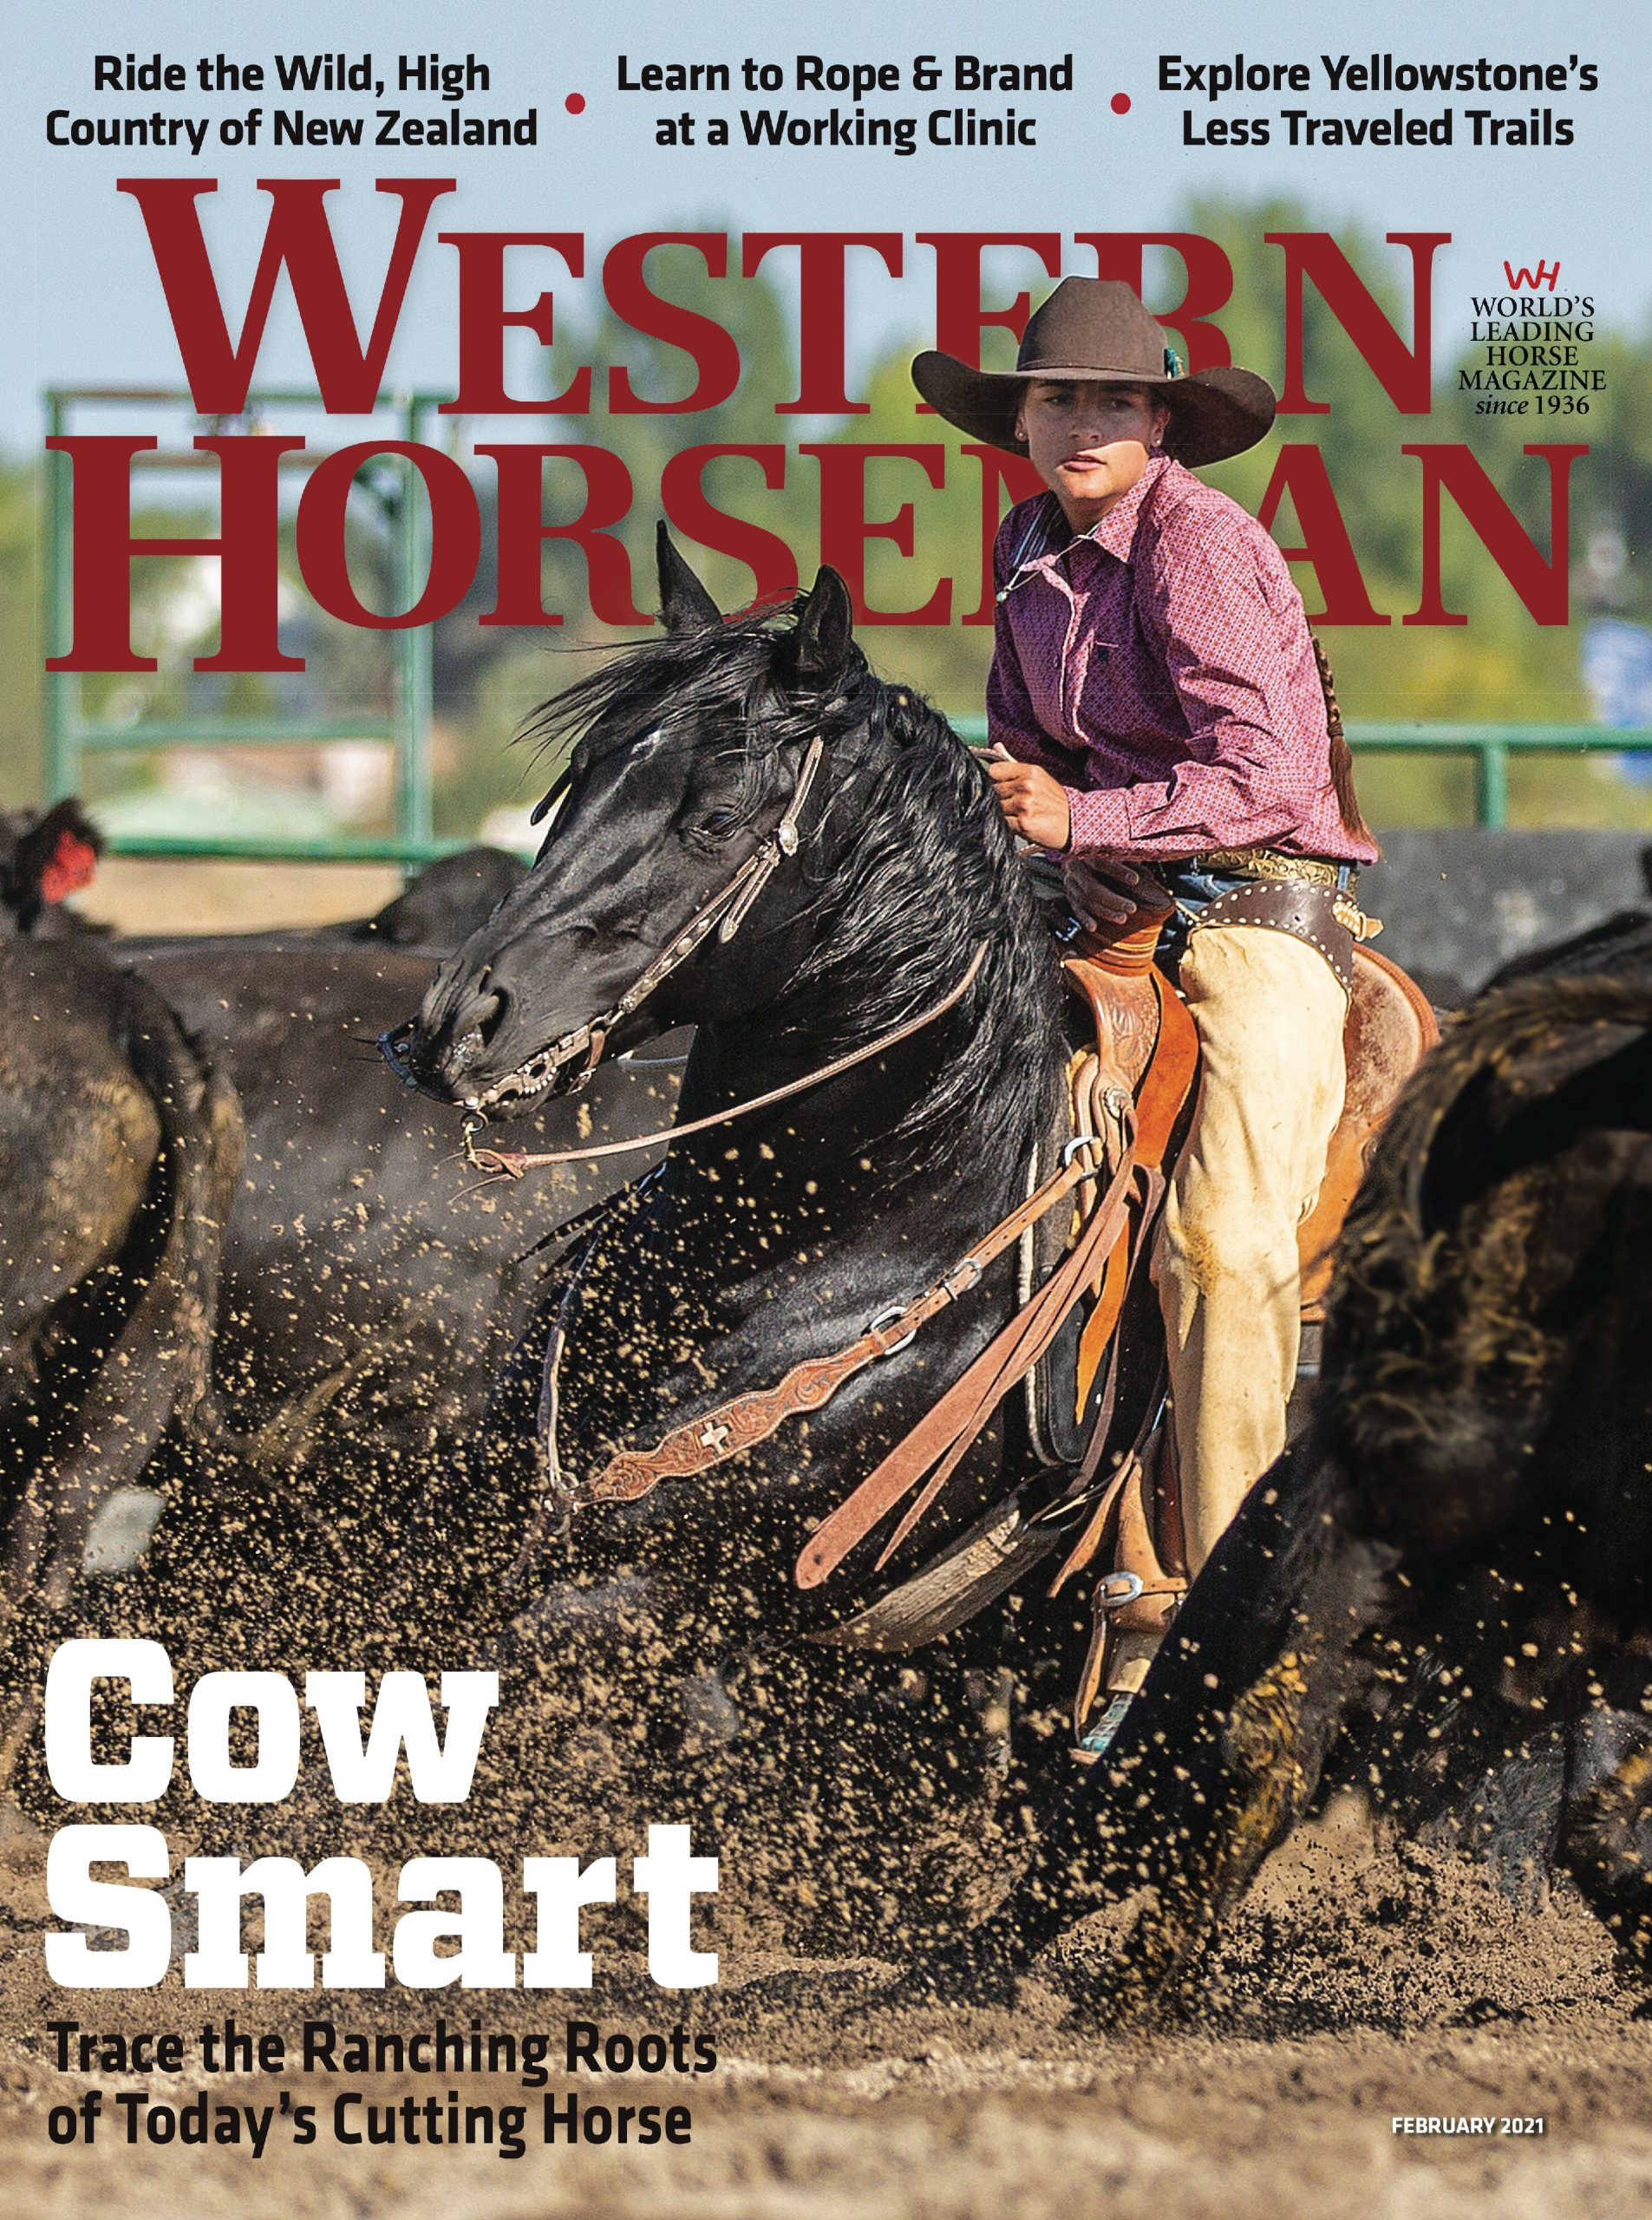 Western Horseman magazine February 2021 cover